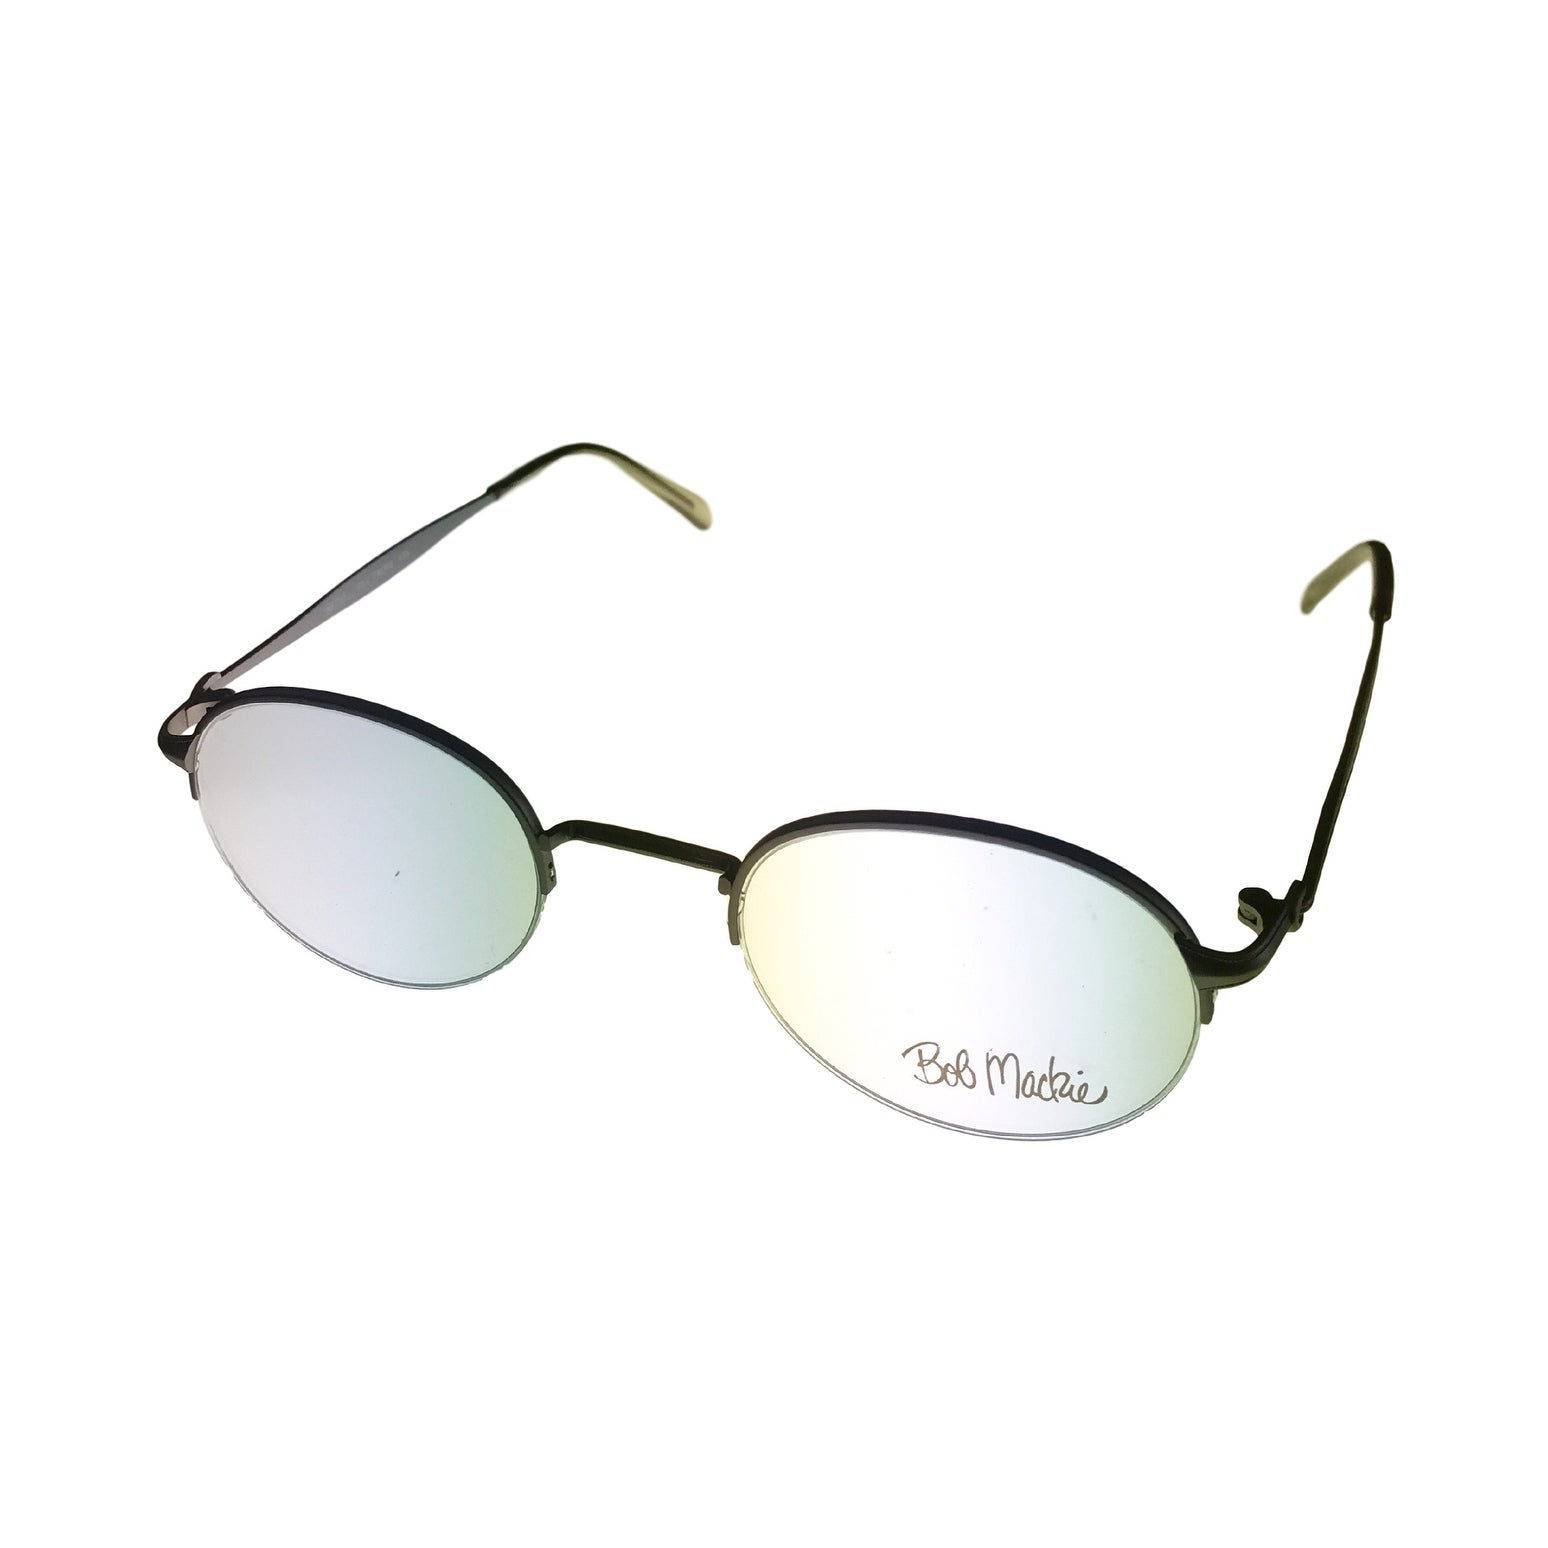 Bob Mackie Mens Opthalmic Eyeglass Rimless Round Metal Frame #854 Satin Taupe - Medium - Thumbnail 0